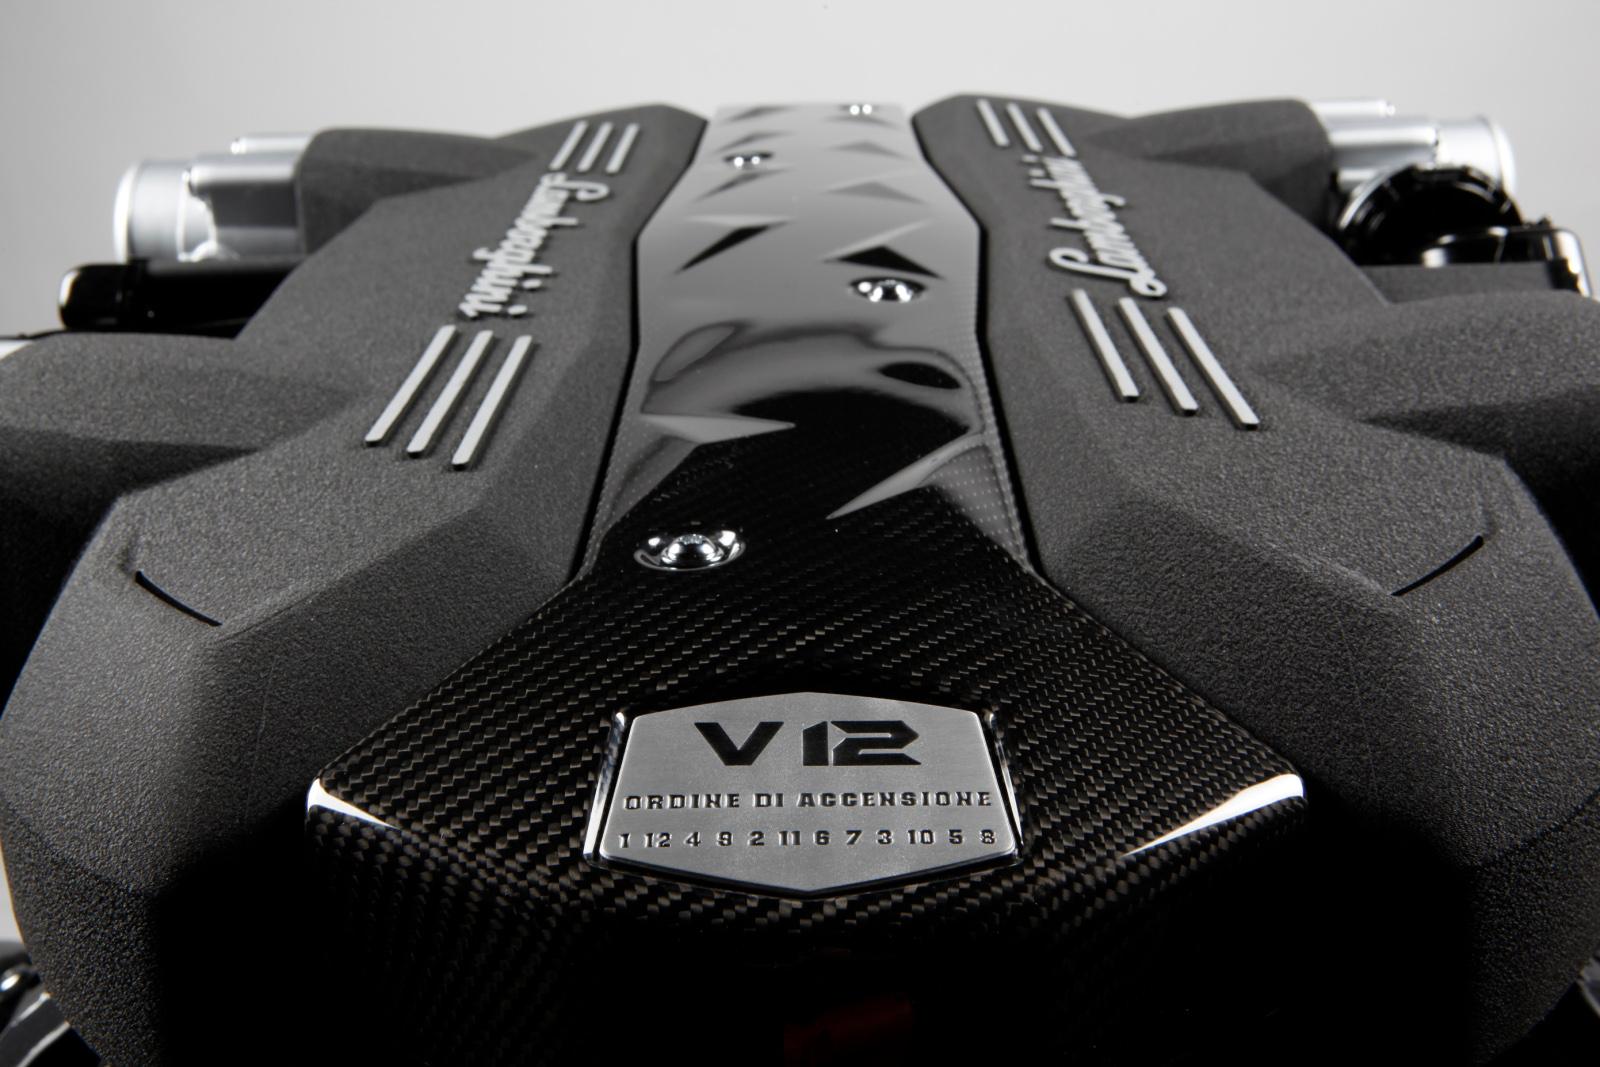 Lamborghini Unveils New 700 Hp 12 Cylinder Powerplant Isr